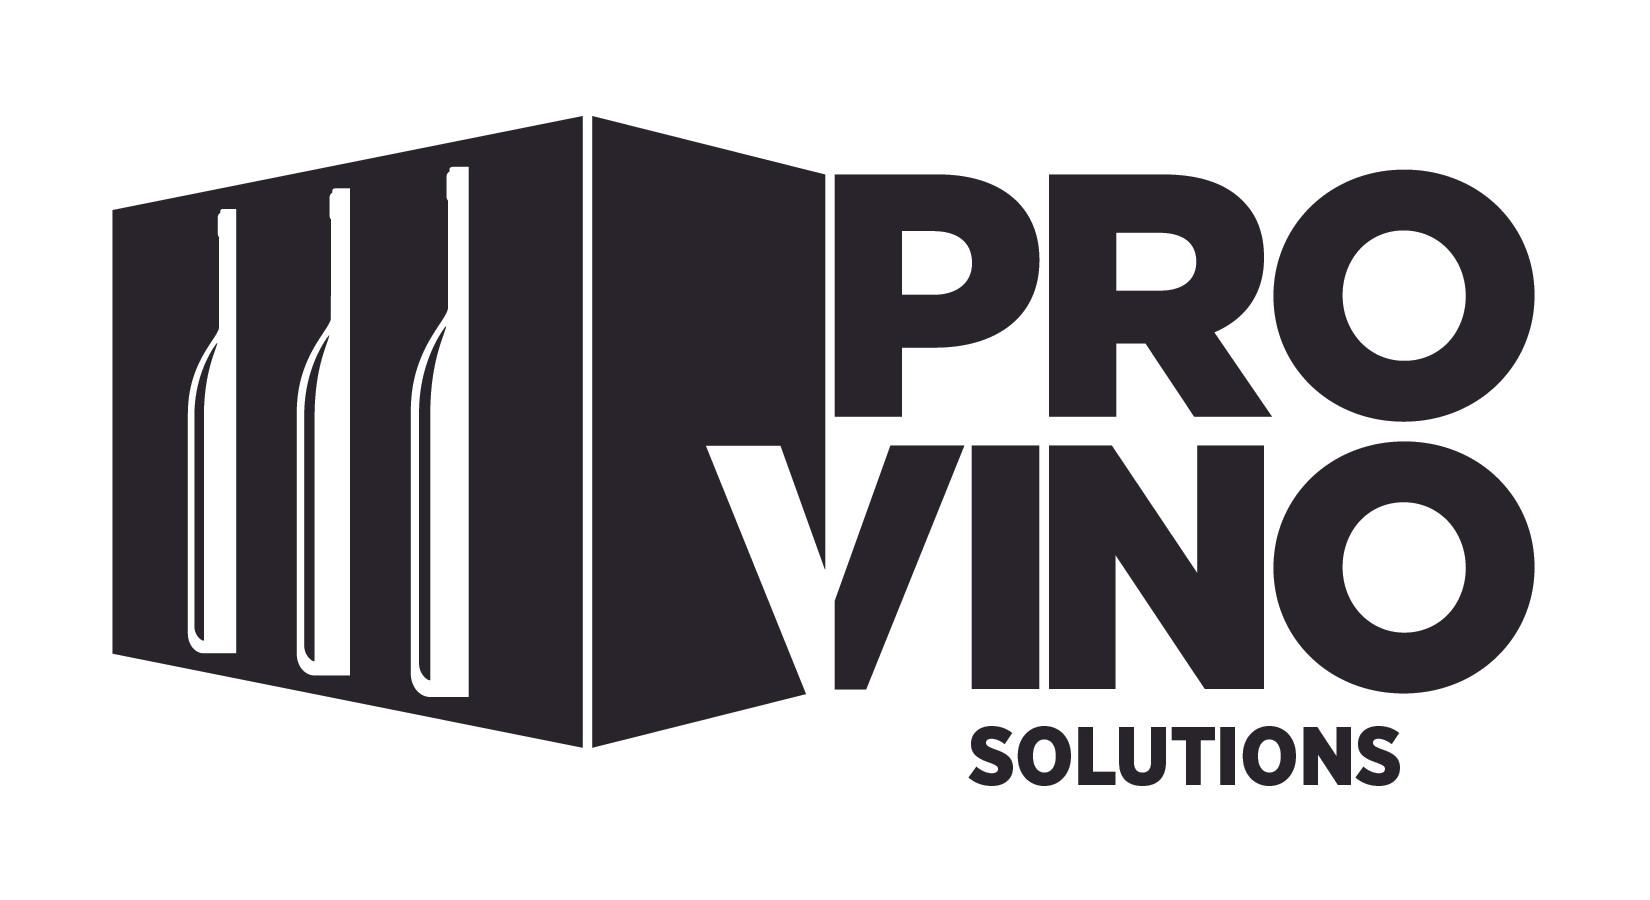 Provino Solutios Logo-Design Process